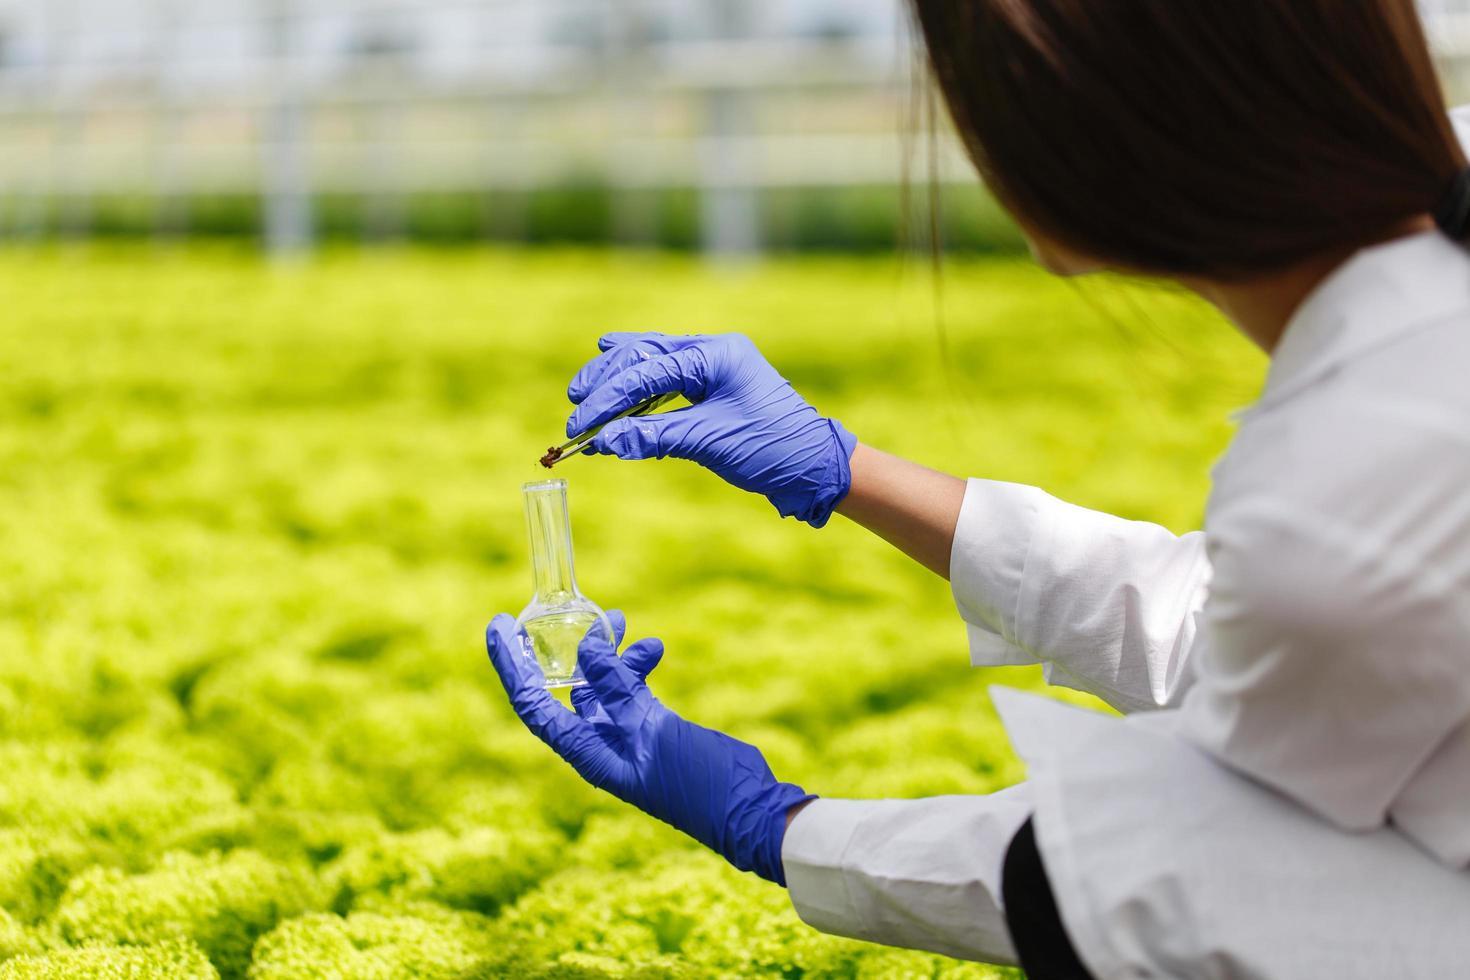 forskaren tar en grön sond i en rundkolv foto